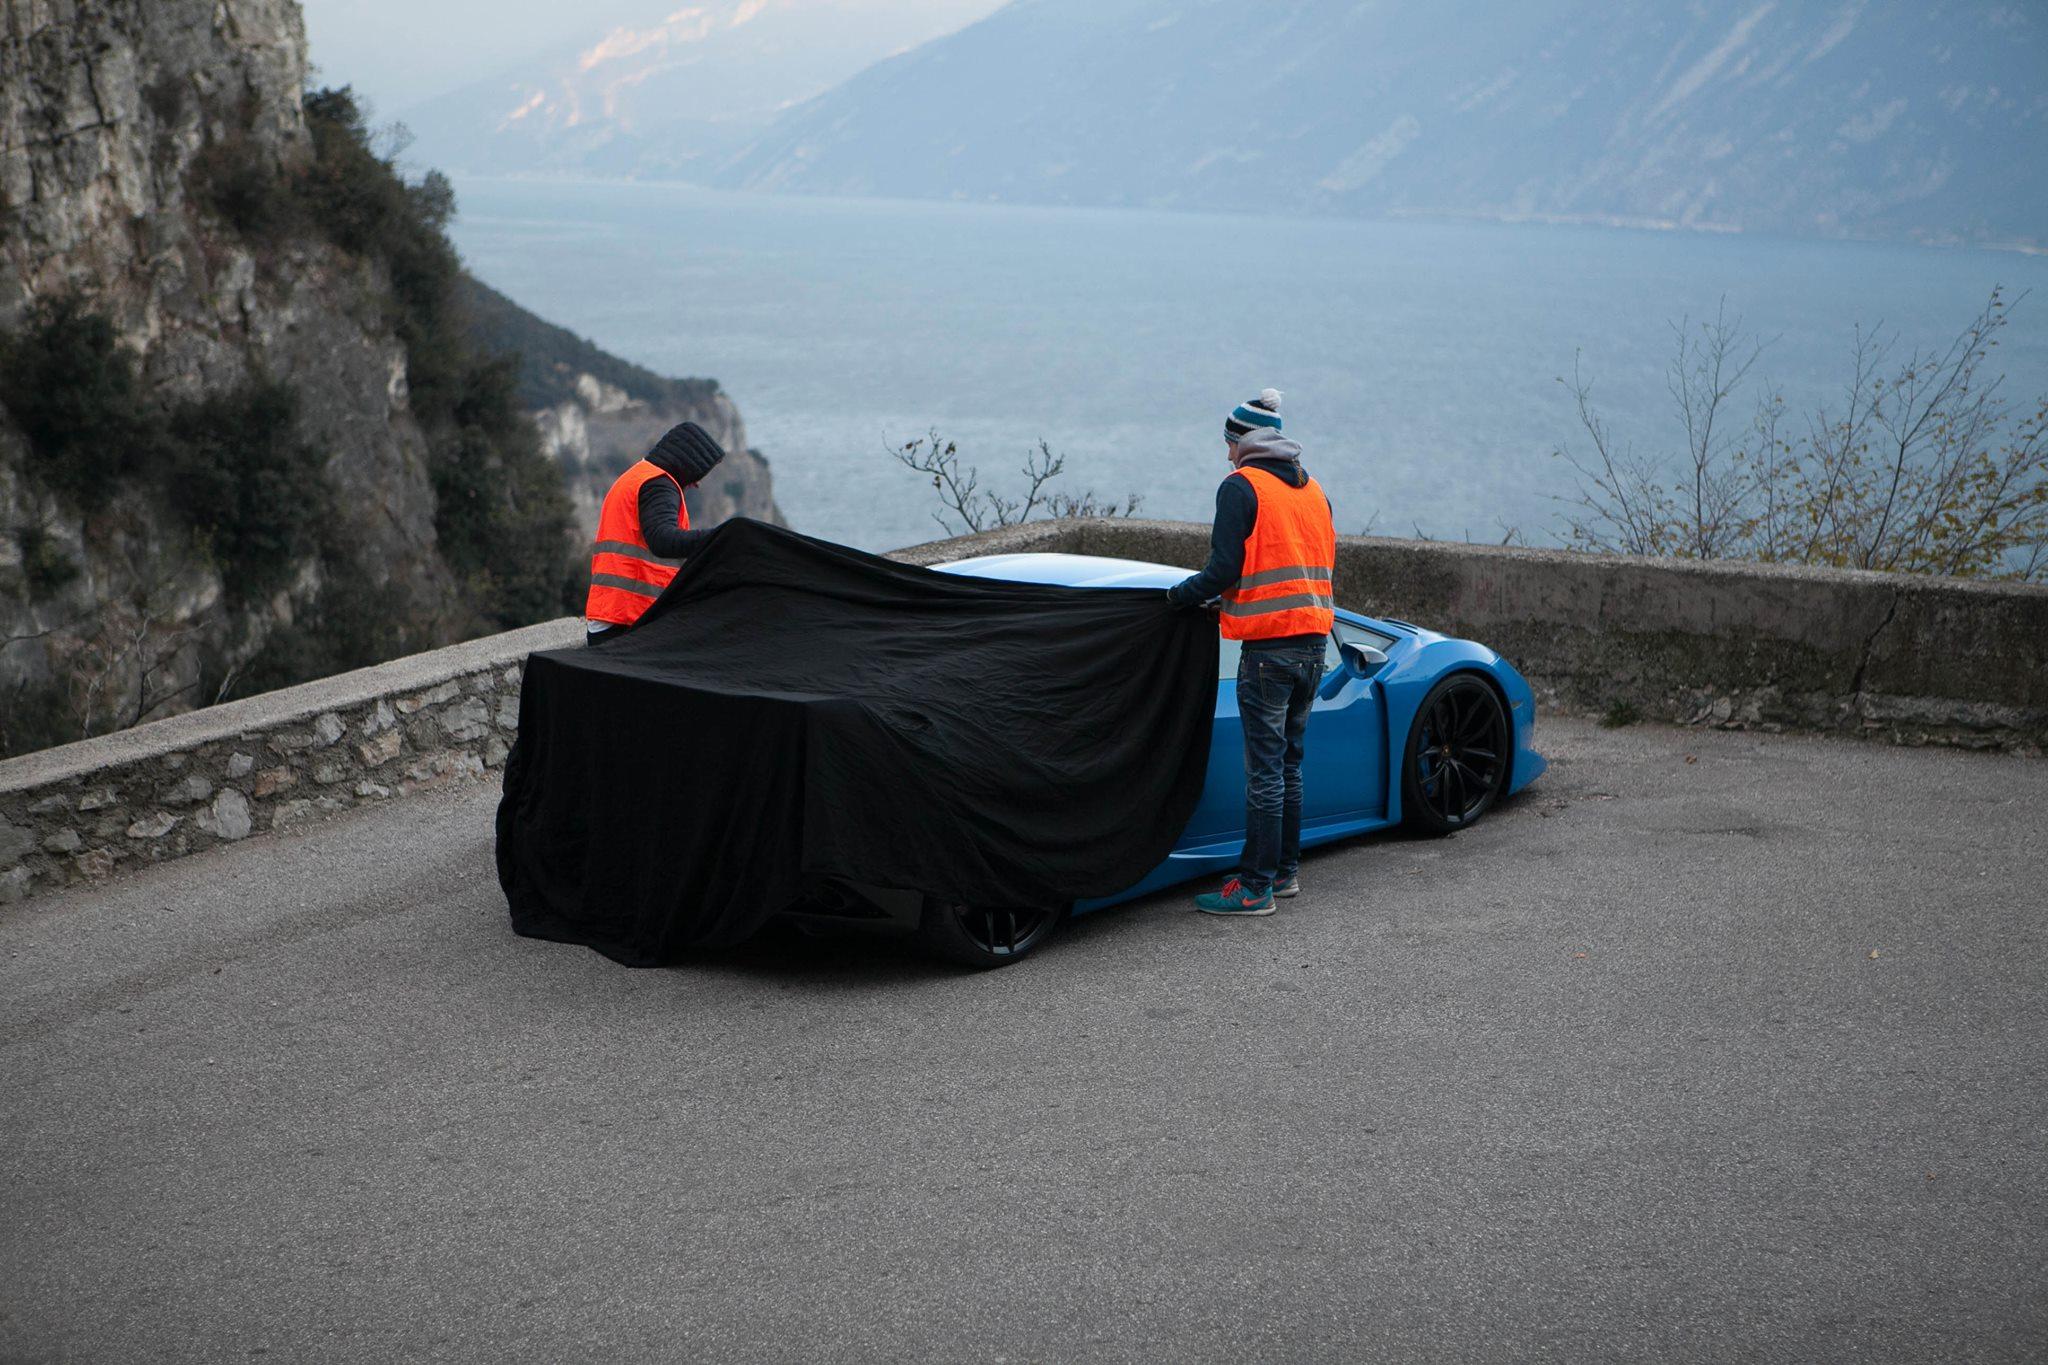 Lamborghini Huracan Superleggera - Foto spia 30-11-2015